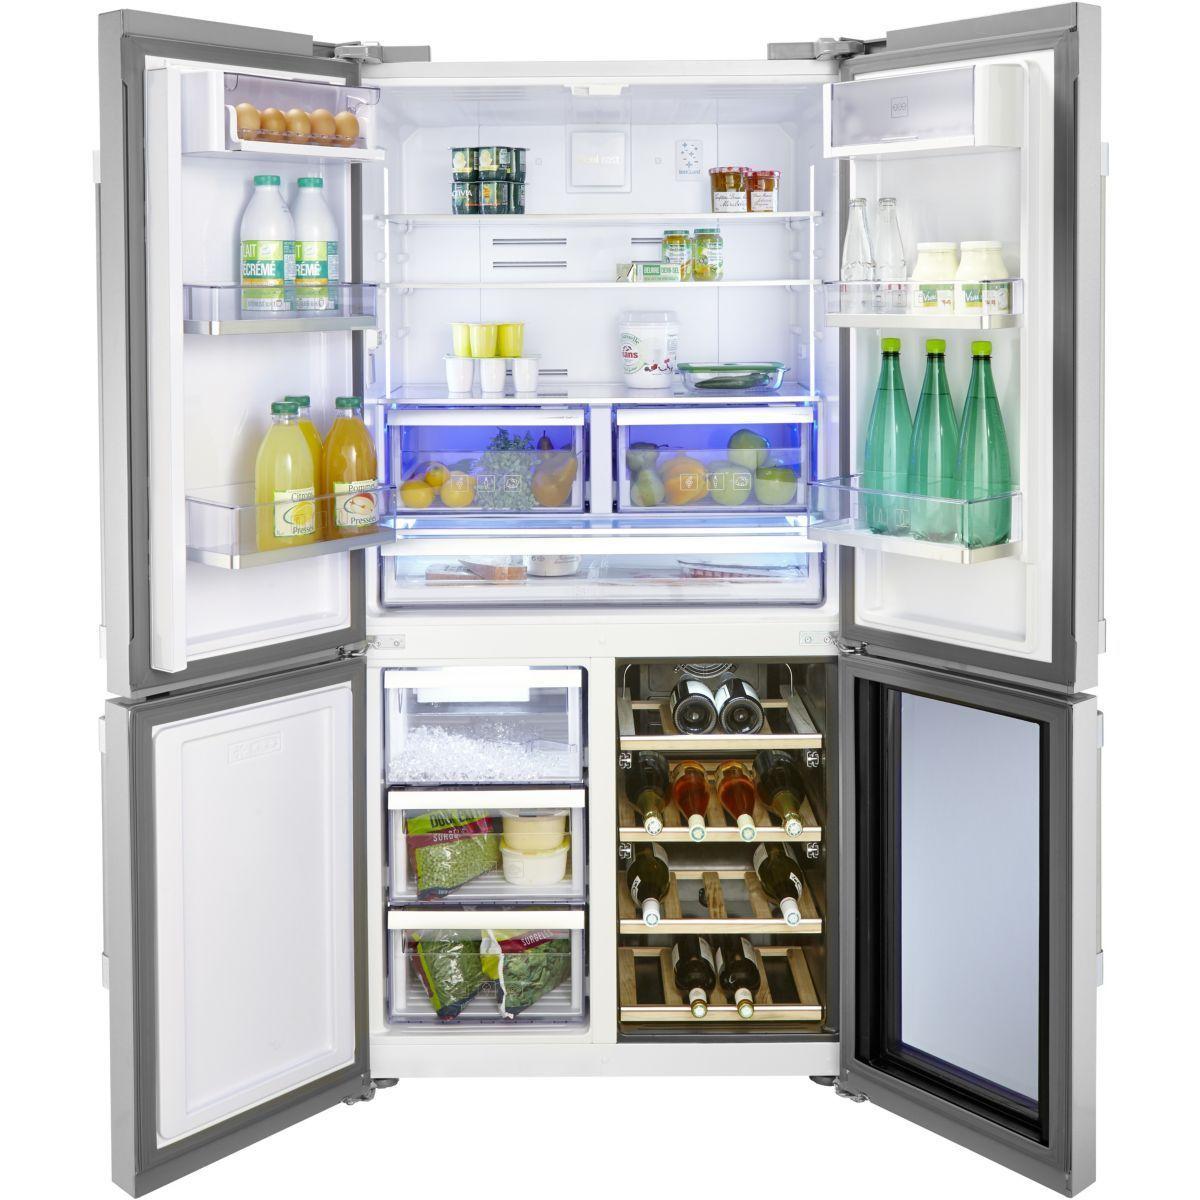 Refrigerateur Multi Portes Gn1416220cx Taille Taille Unique Cave A Vin Refrigerateur Refrigerateur Americain